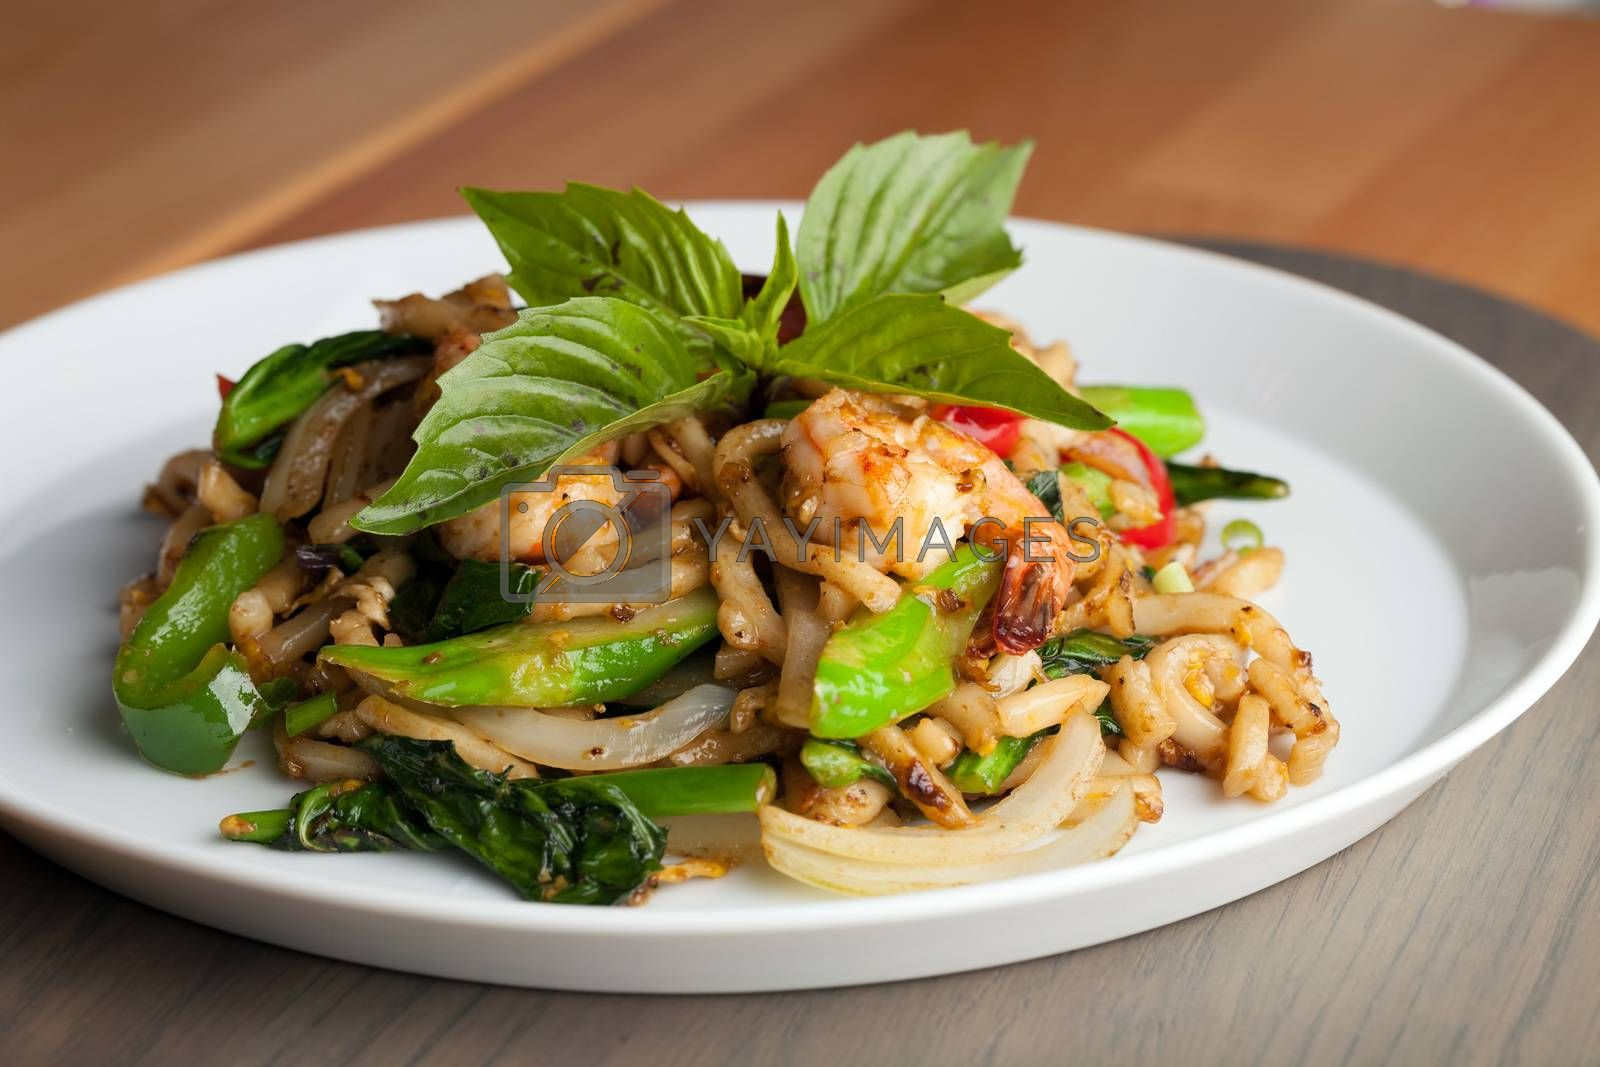 Thai Shrimp Stir Fry by graficallyminded